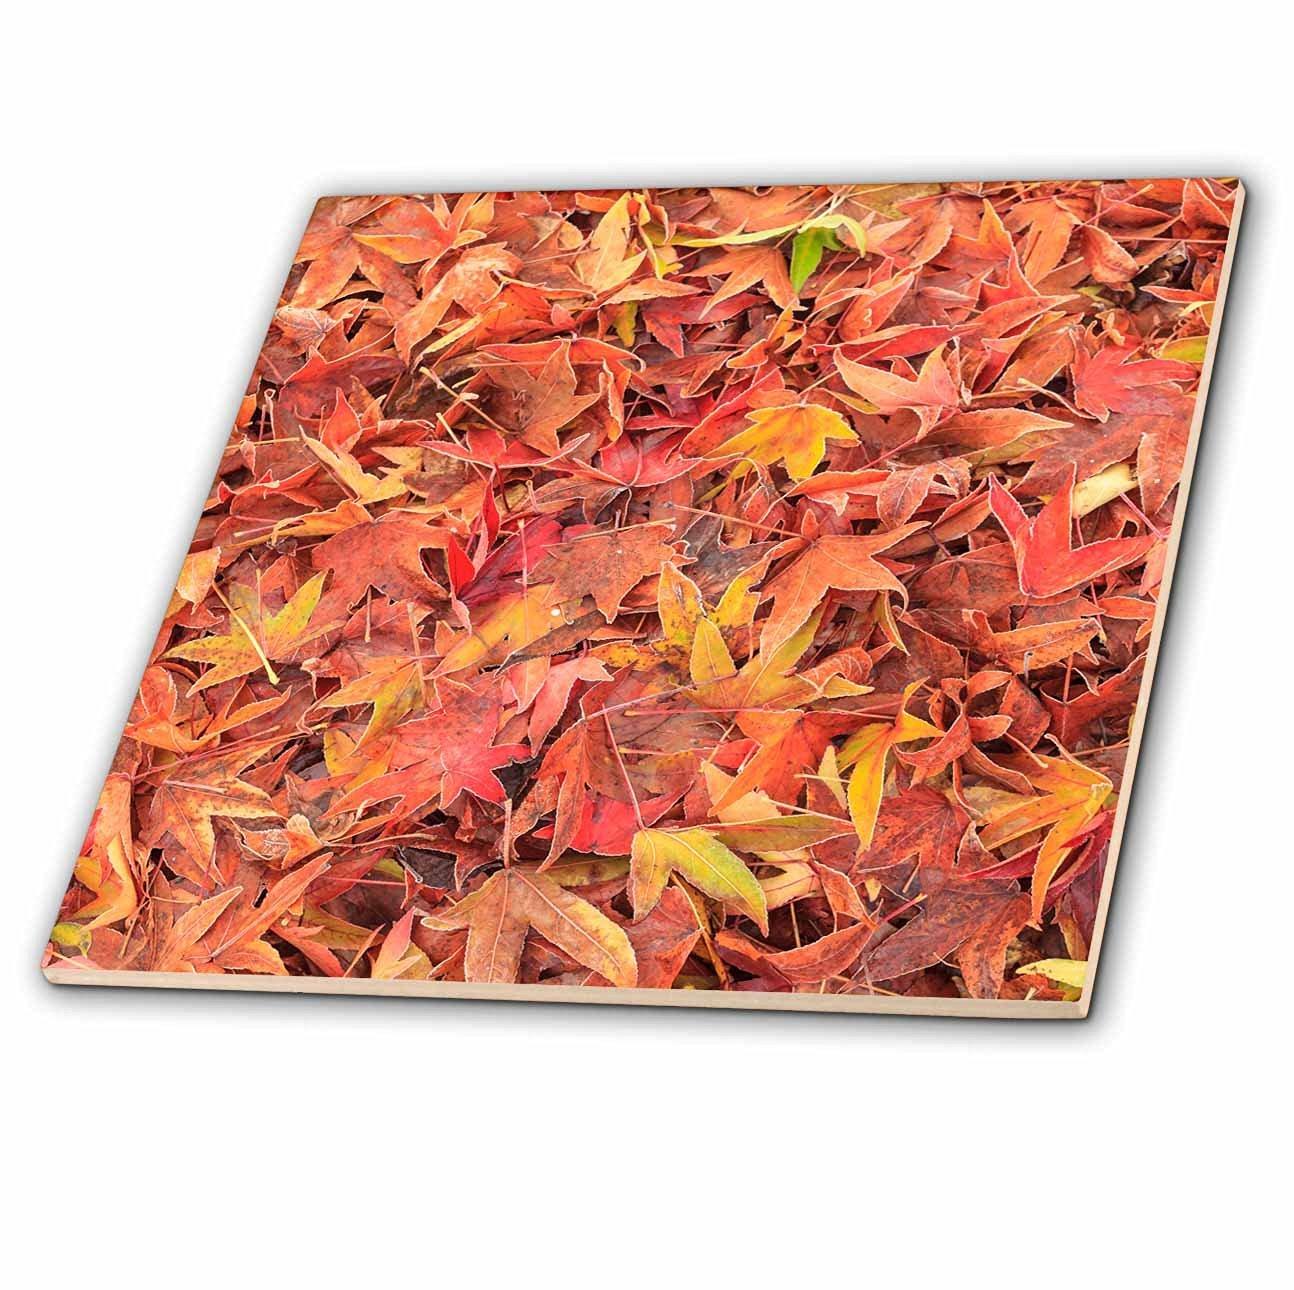 Danita Delimont - Autumn - Autumn color, maple leaves, Mill Creek, Washington State, USA - 6 Inch Ceramic Tile (ct_231821_2)